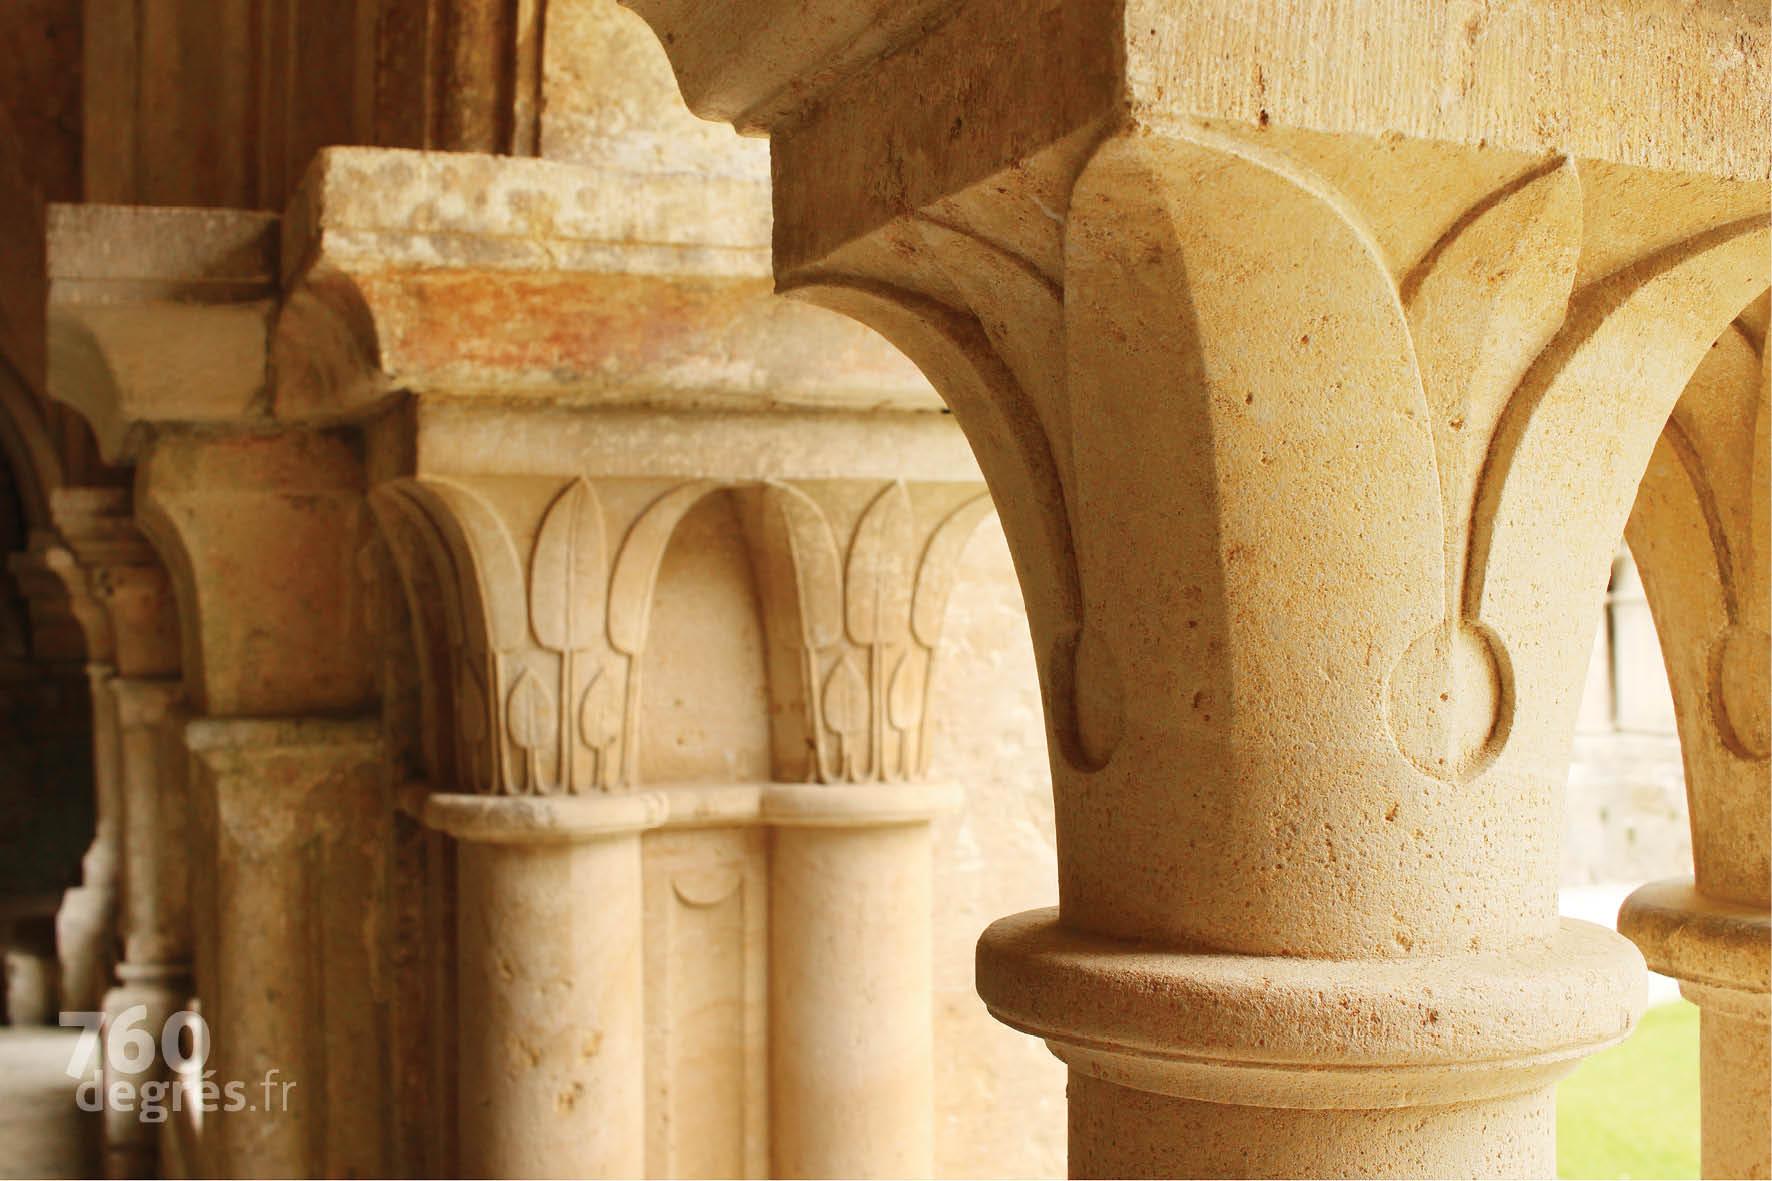 760degres-abbaye-fontenay-09